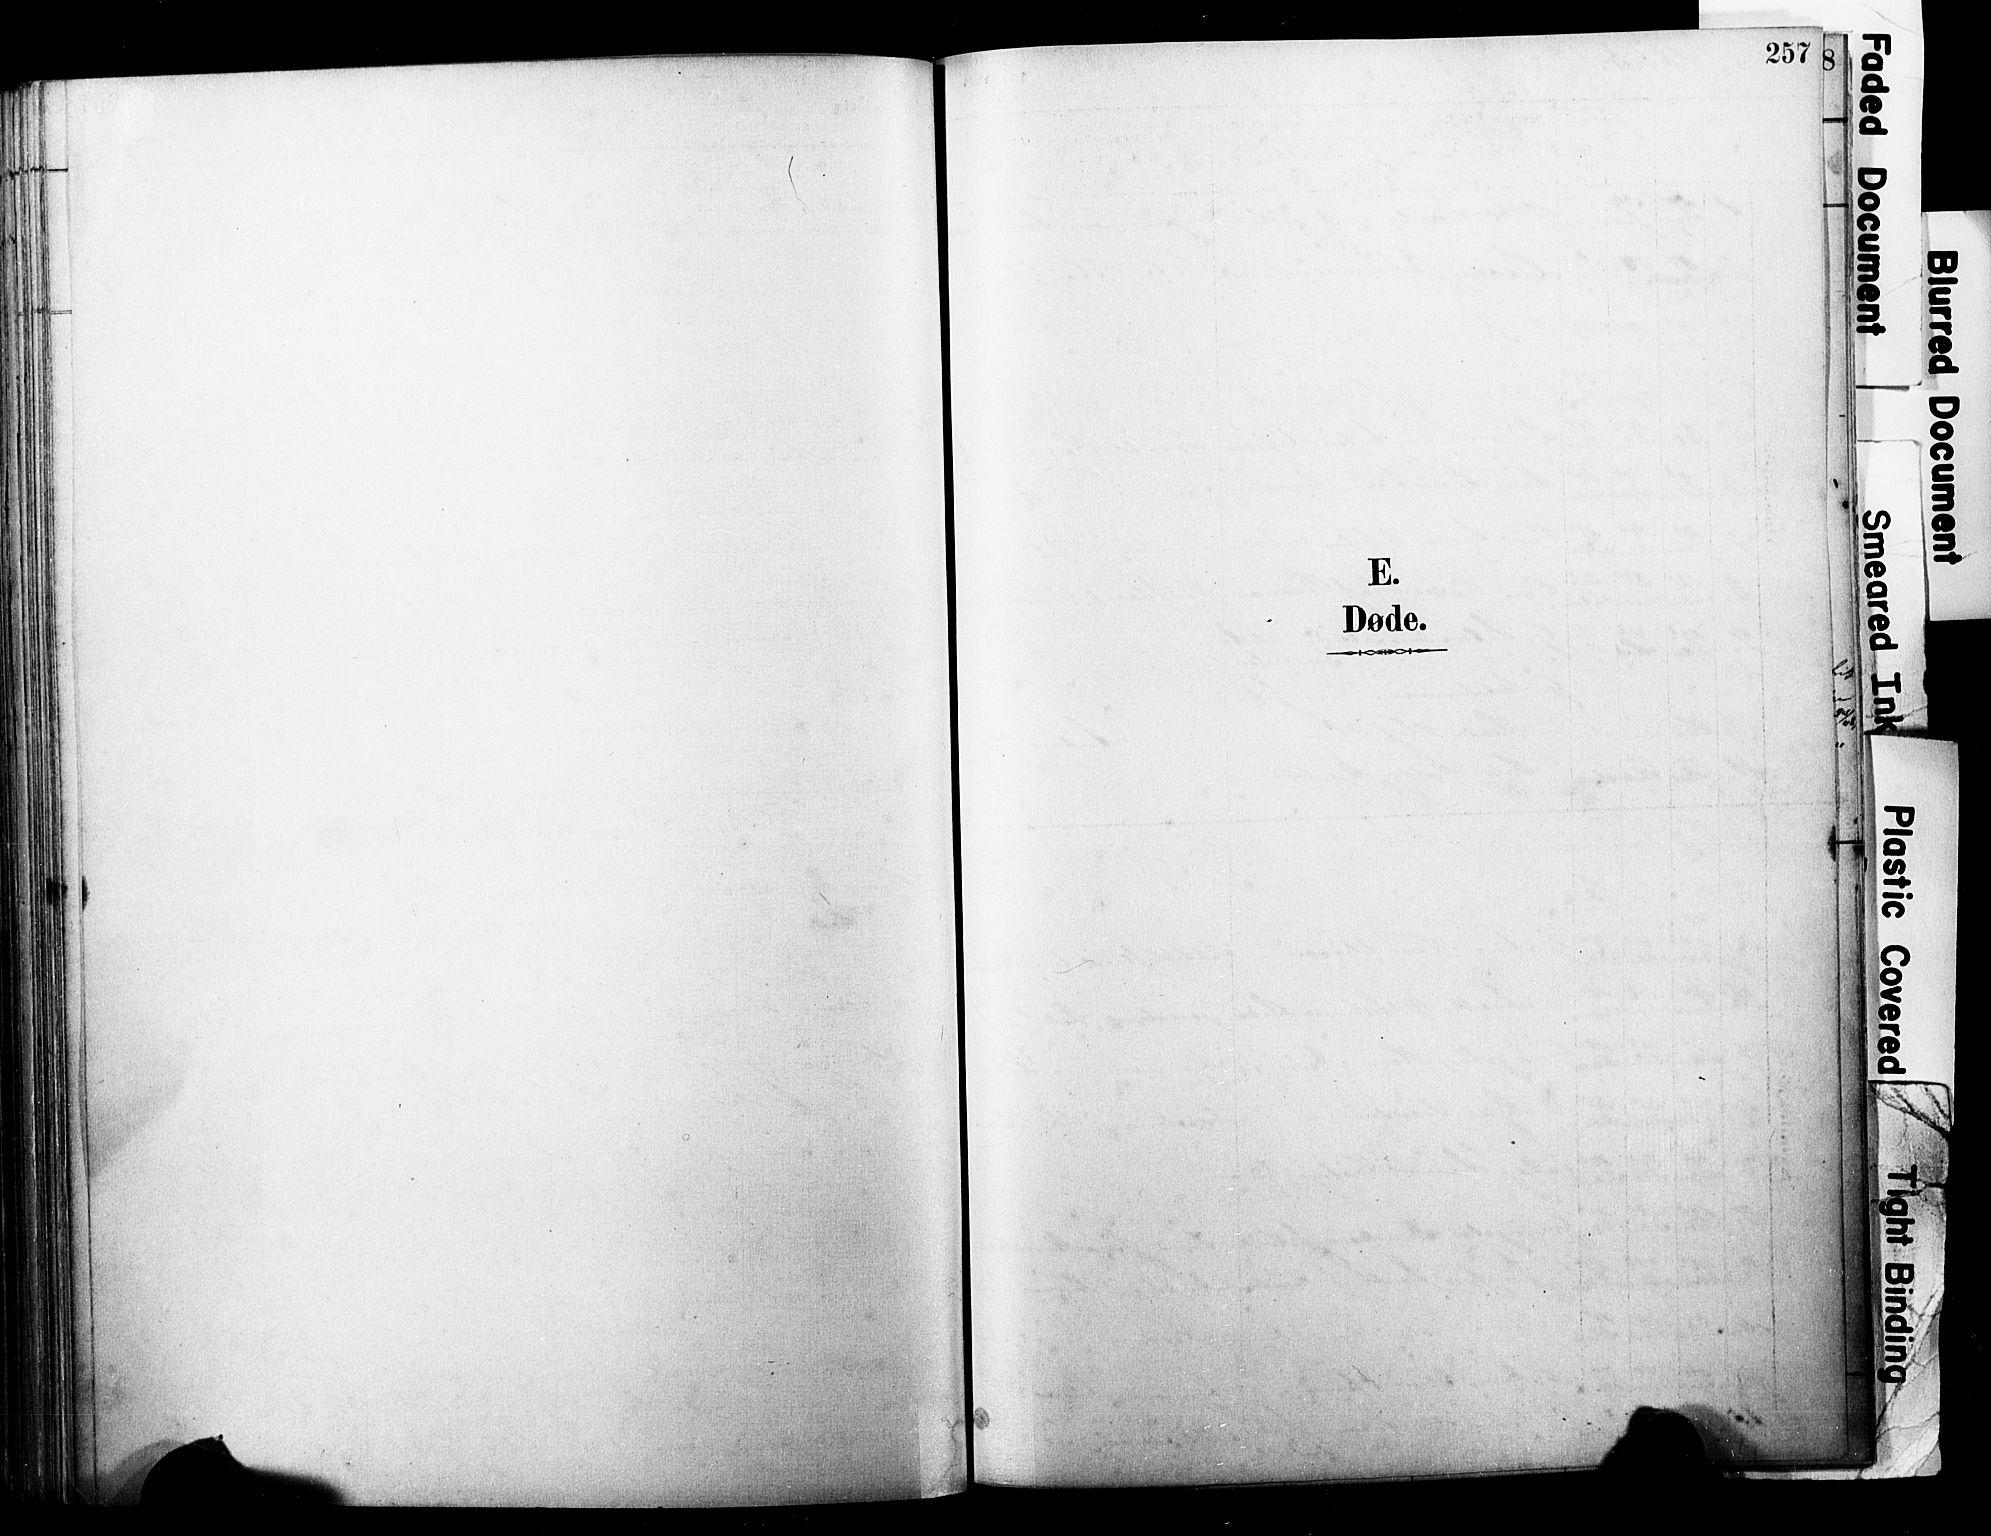 SAKO, Horten kirkebøker, F/Fa/L0004: Parish register (official) no. 4, 1888-1895, p. 257